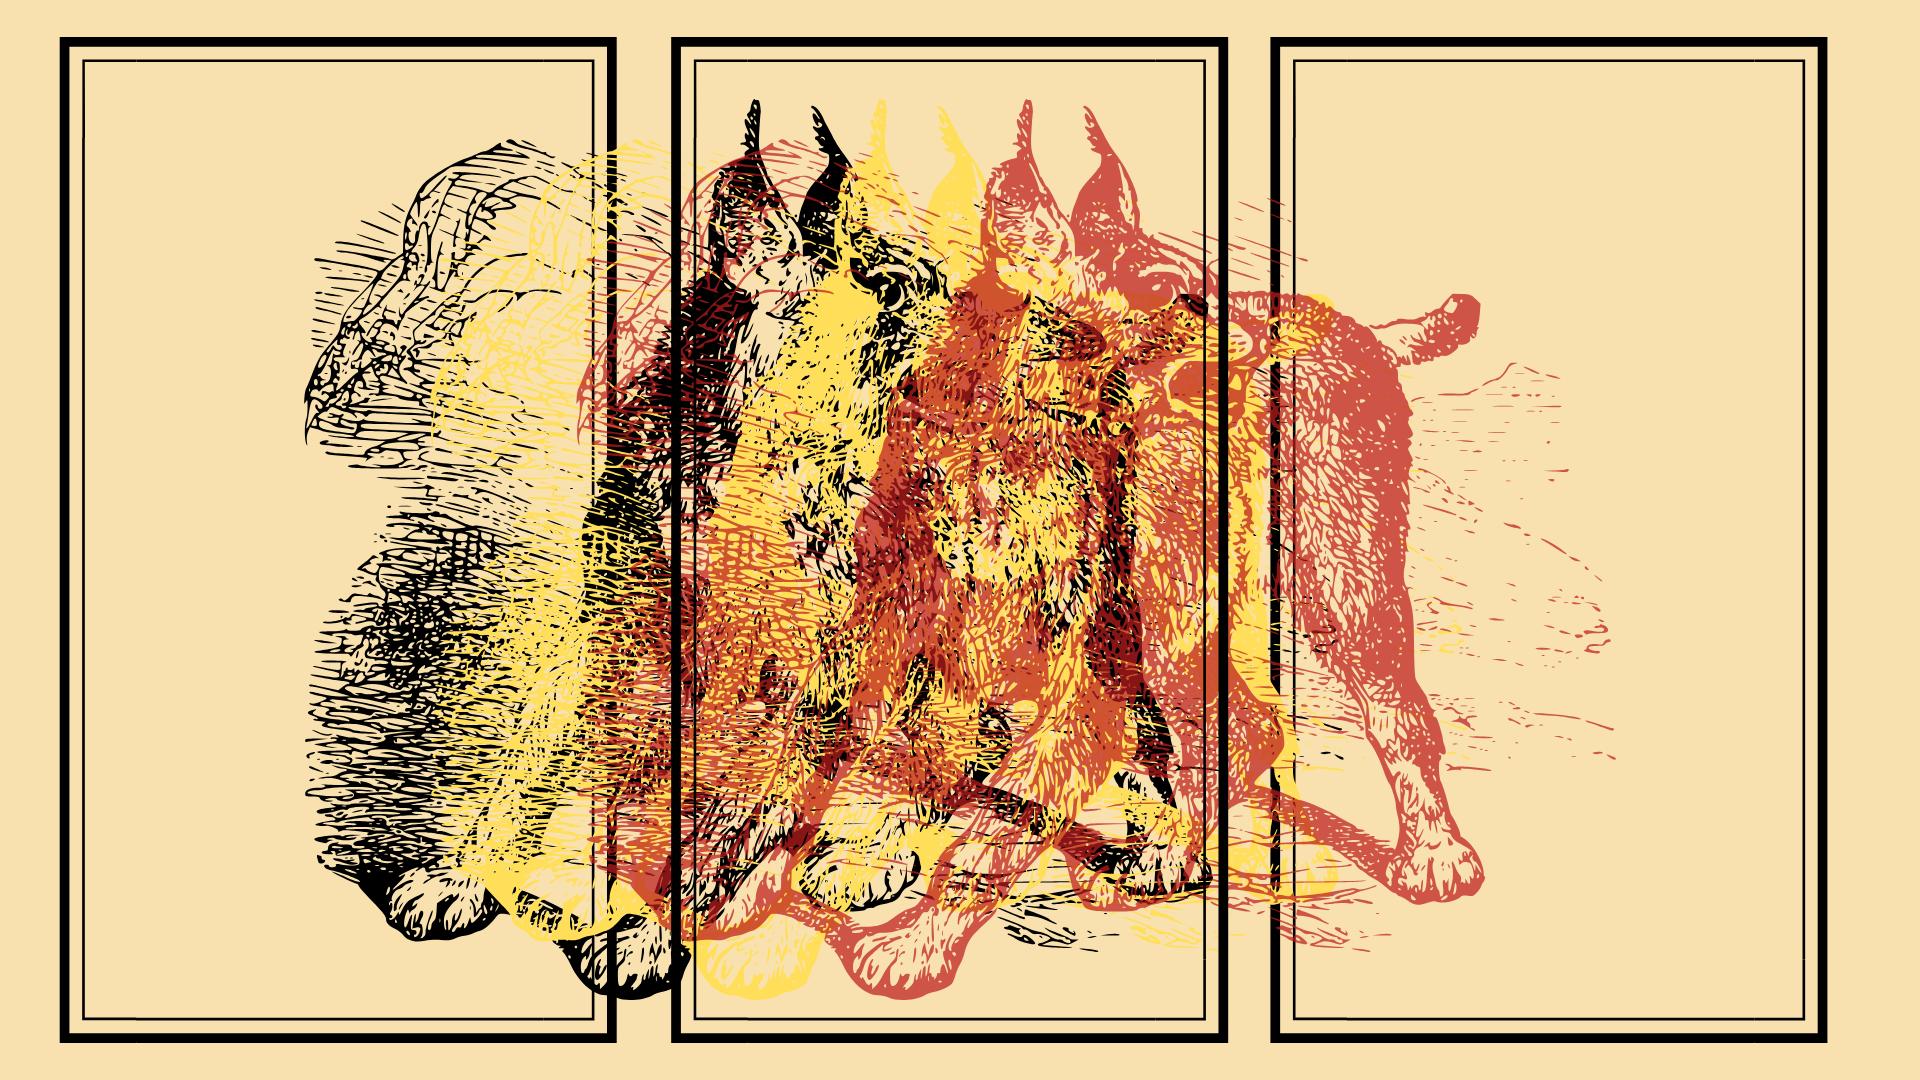 Background: Cat's Child